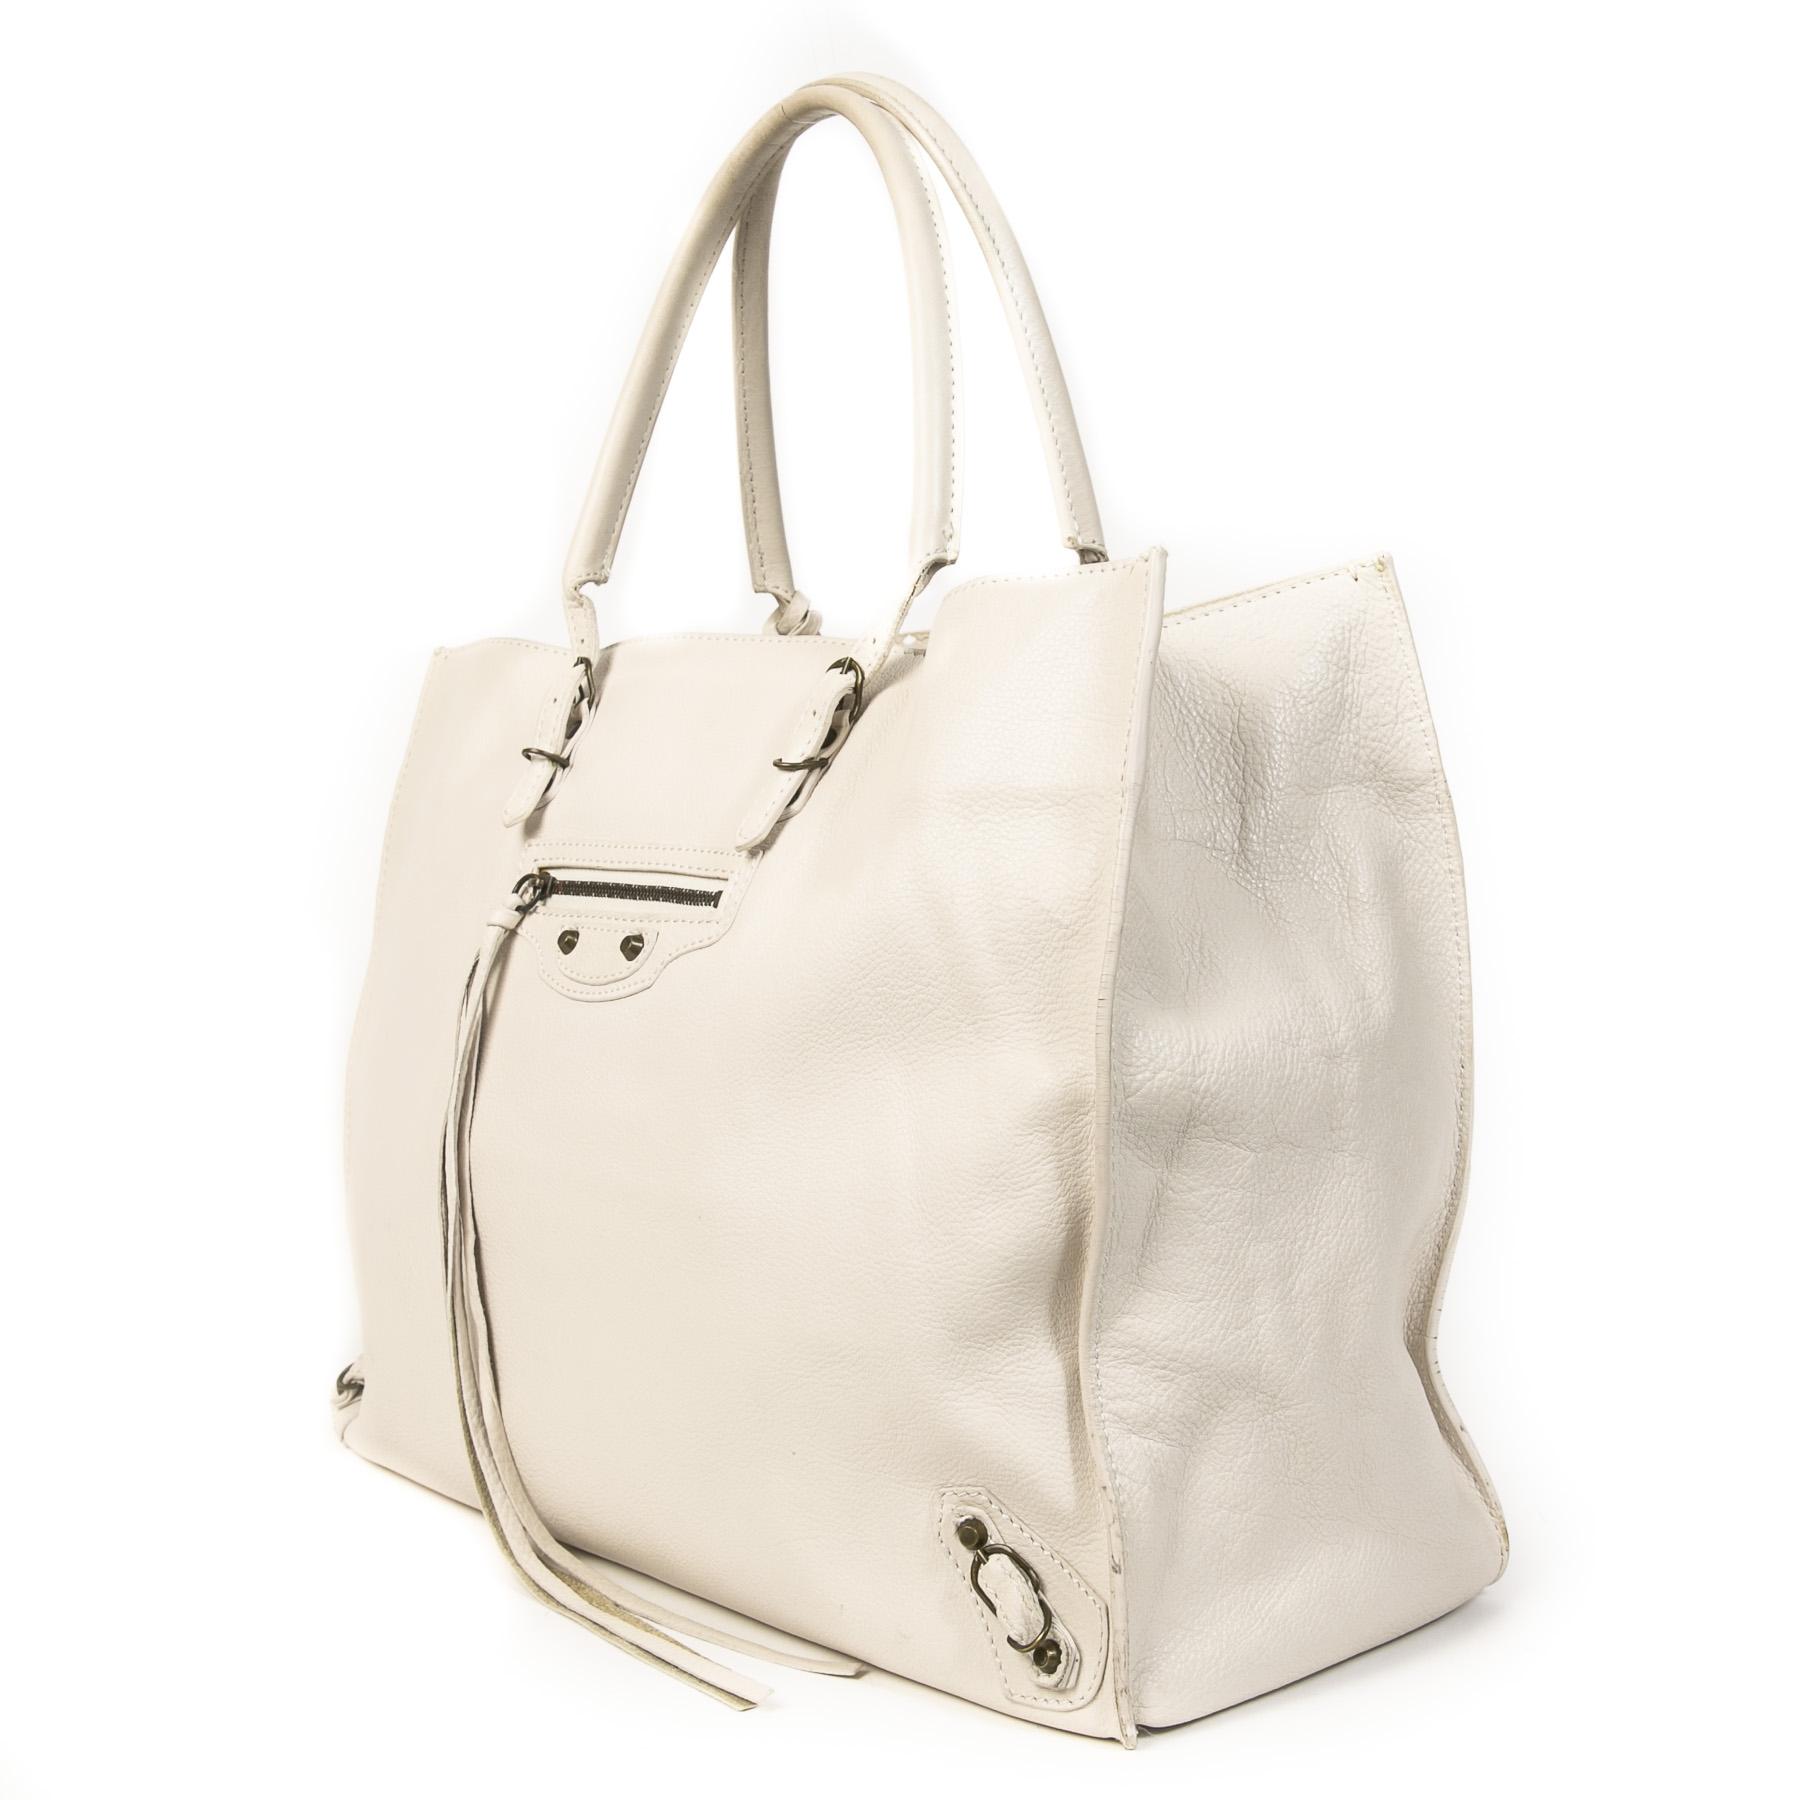 Authentic second-hand vintage Balenciaga Papier A4 Tote Bag buy online webshop LabelLOV